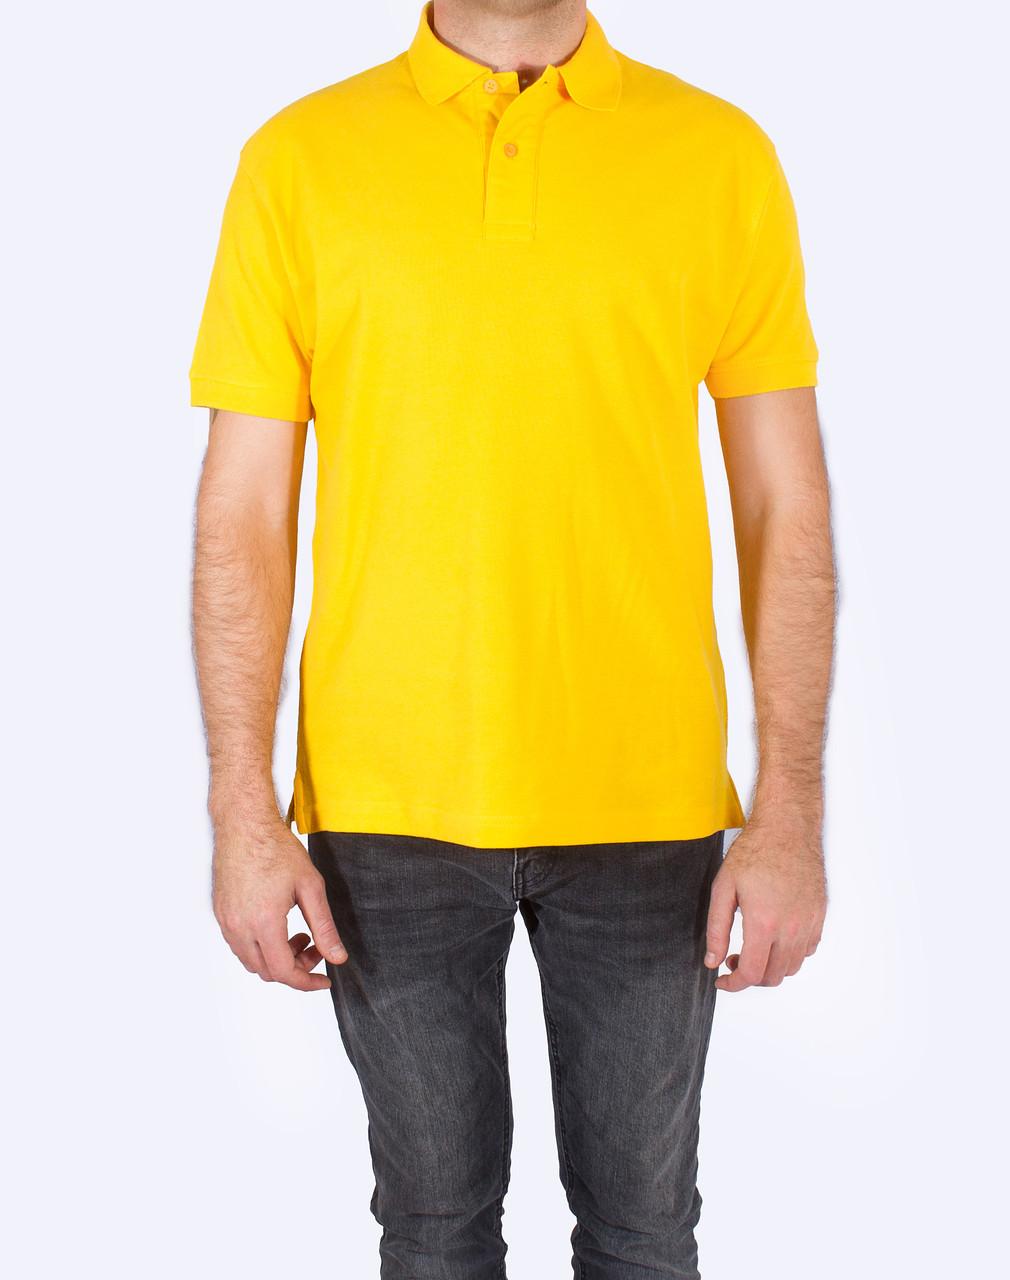 Поло - футболка желтая, мужская, JHK T-shir, однотонная, промо одежда, от XS до XXL